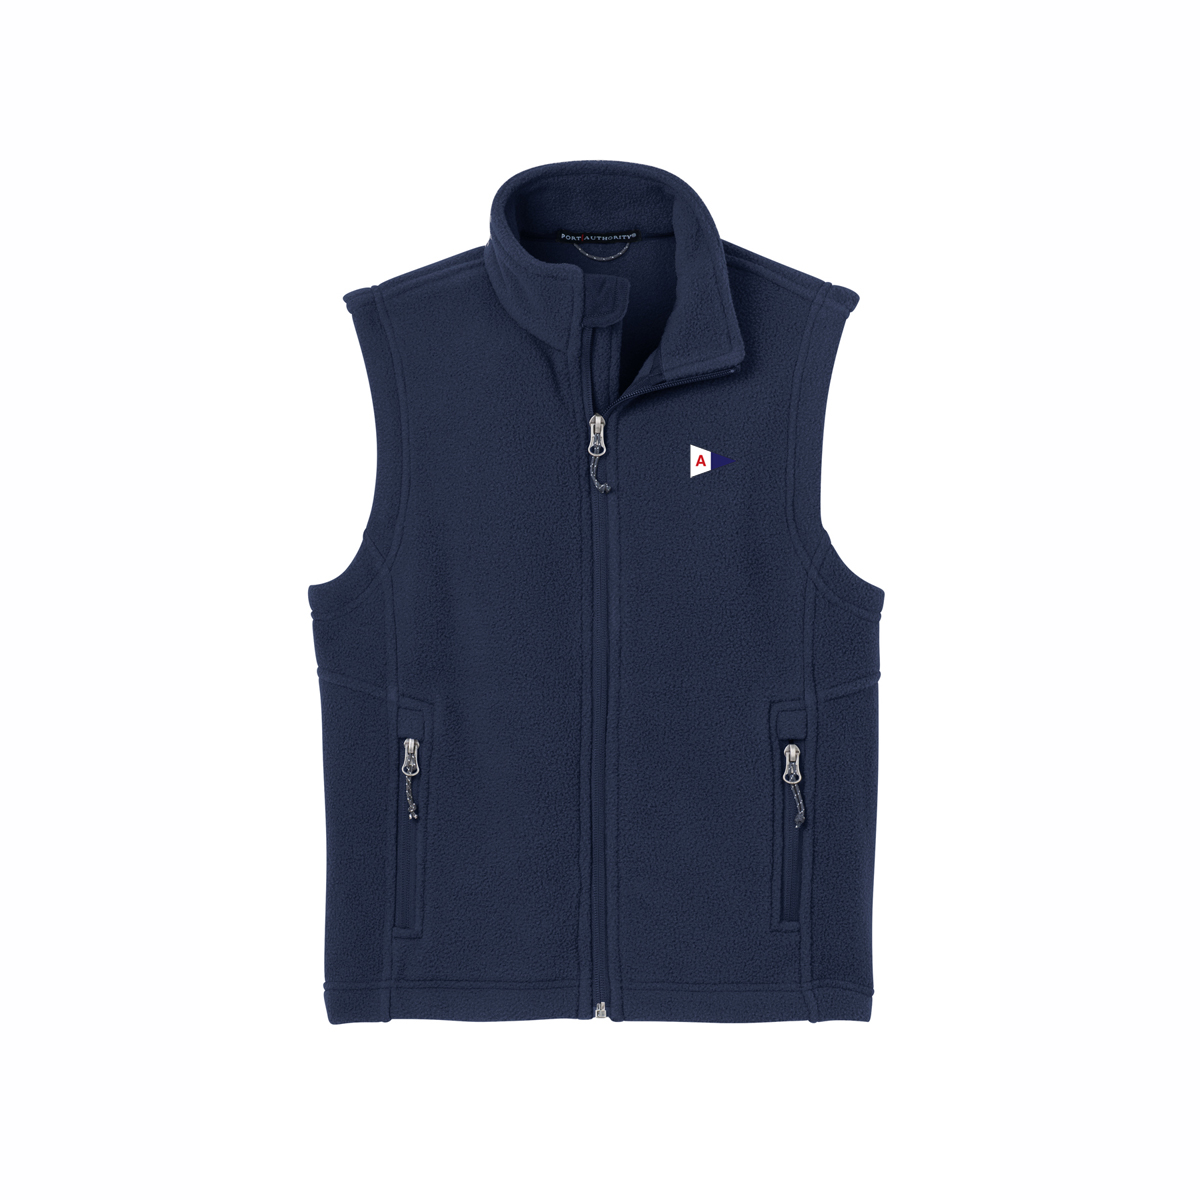 Arundel Yacht Club - Youth Fleece Vest